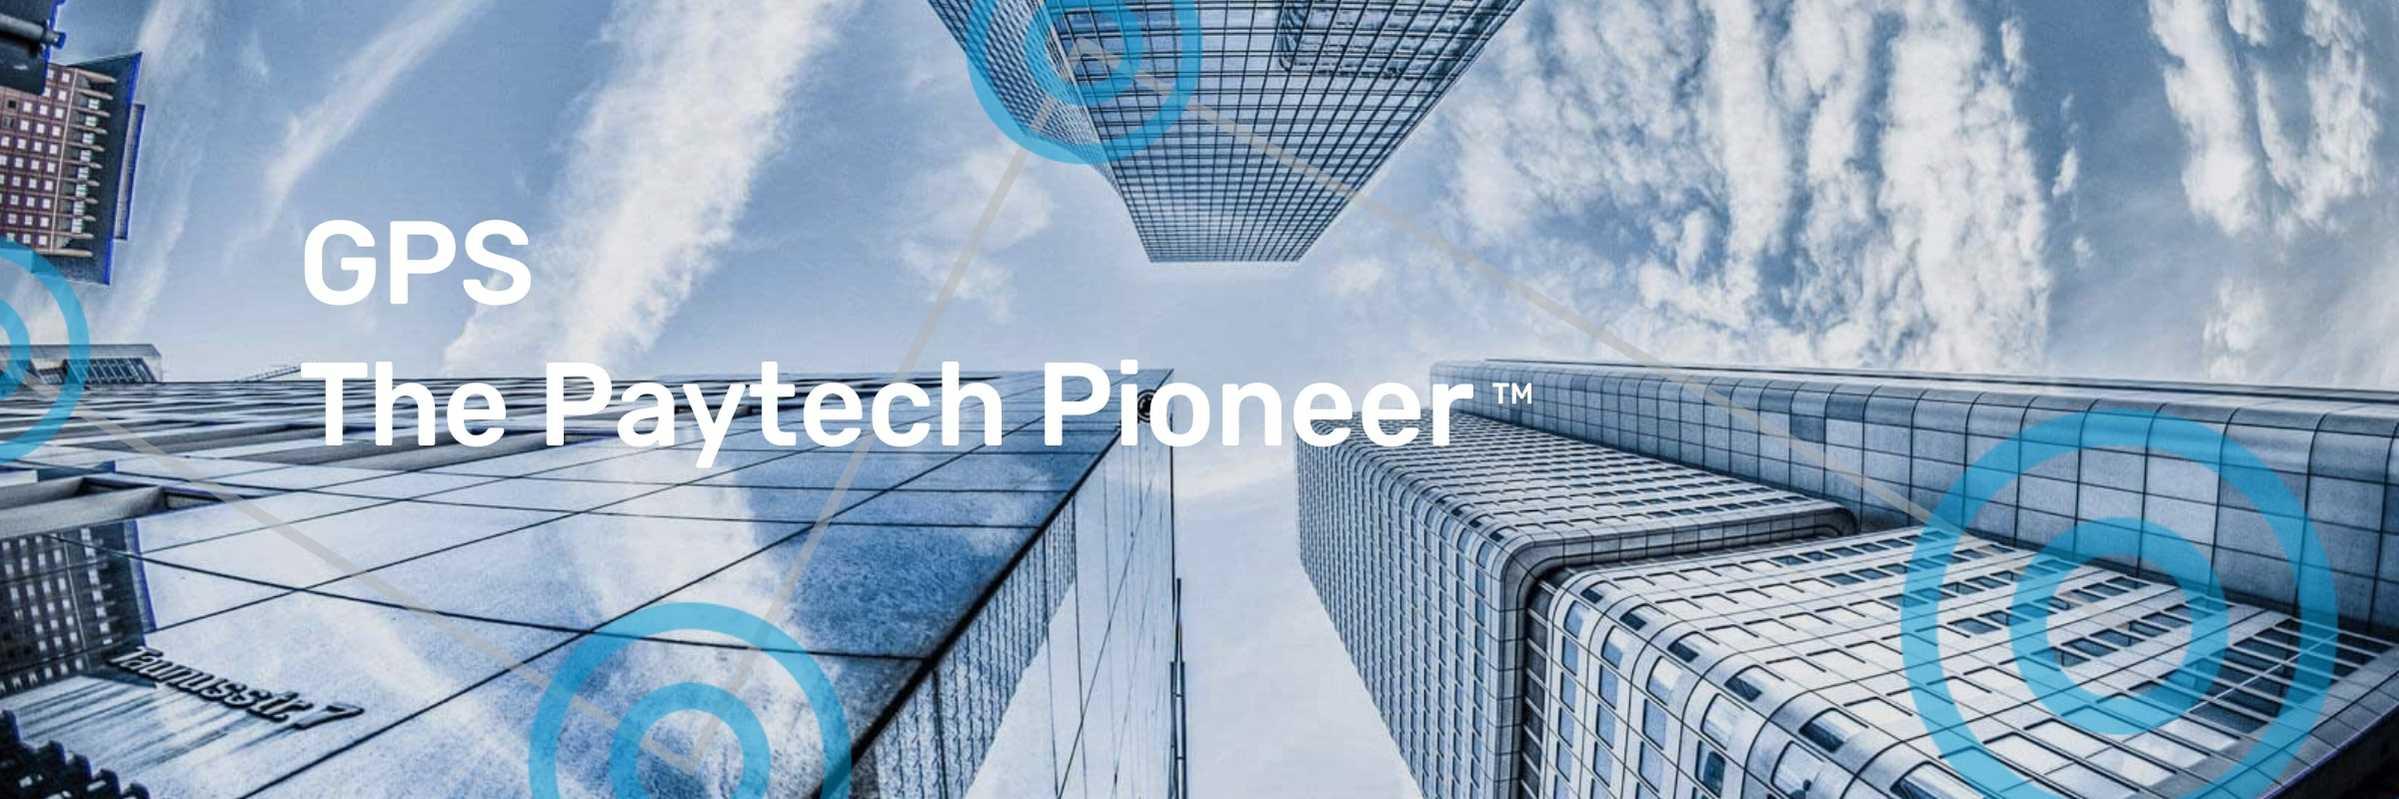 gps-the-paytech-pioneer-slogan-buildings-behind-2